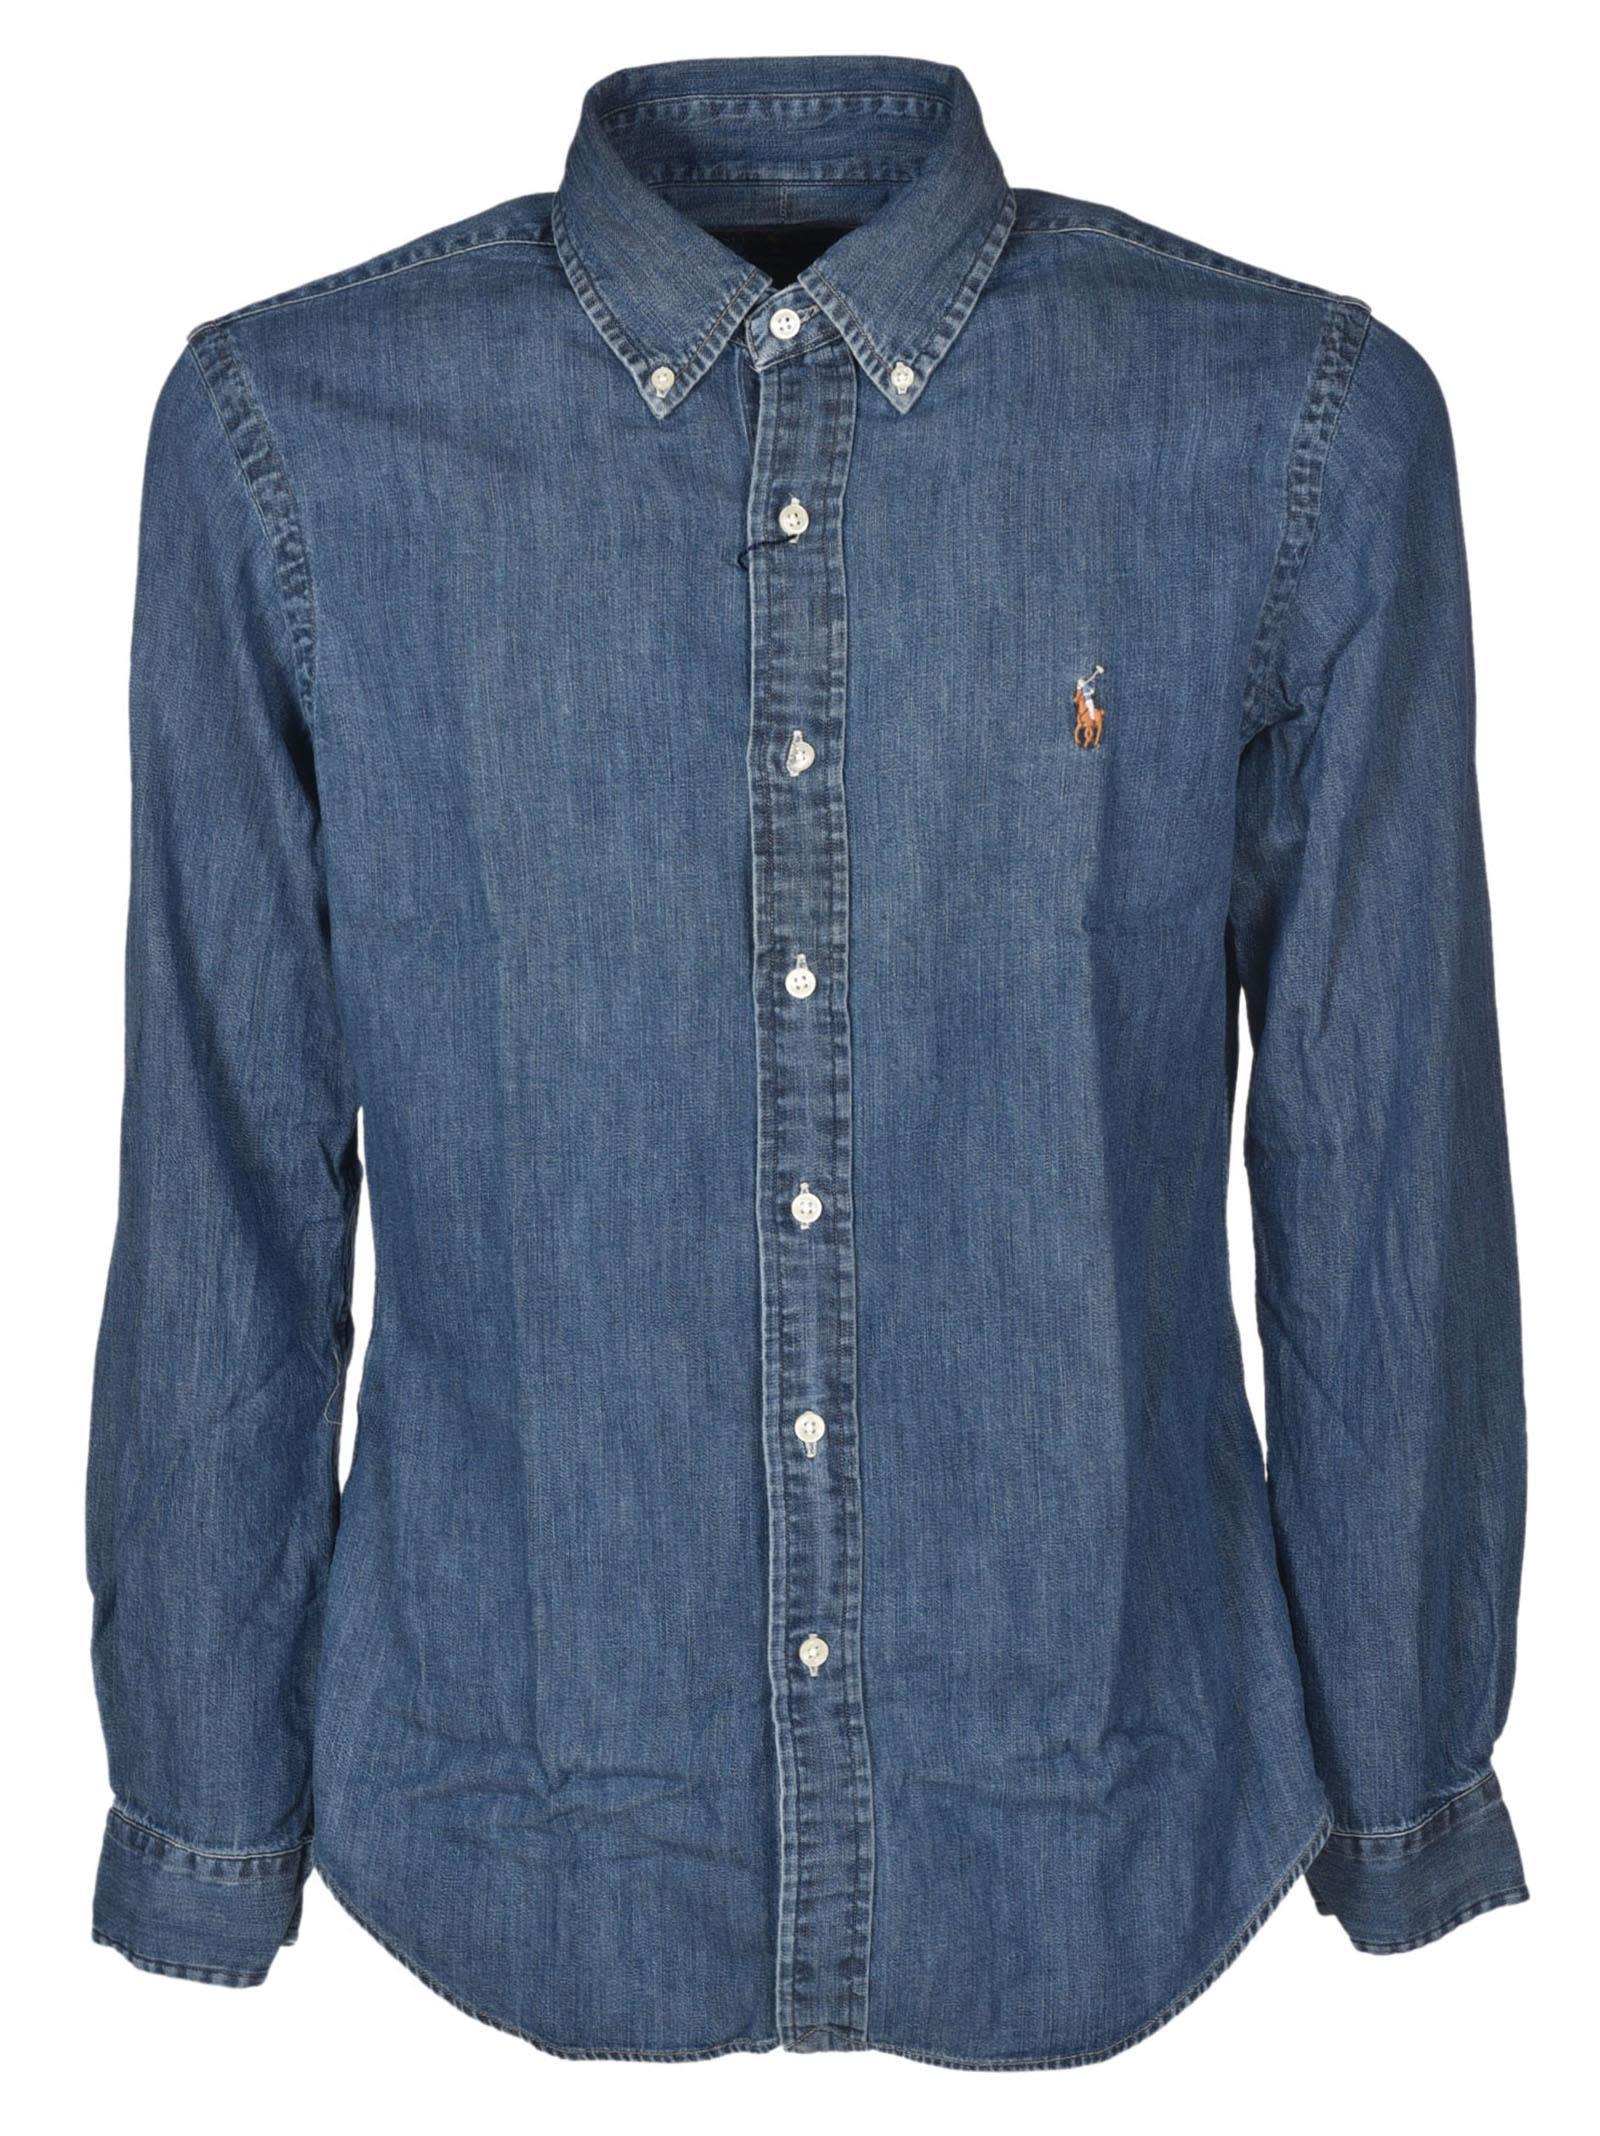 efef3e878f9ae Polo Ralph Lauren Slim Fit Denim Sport Shirt